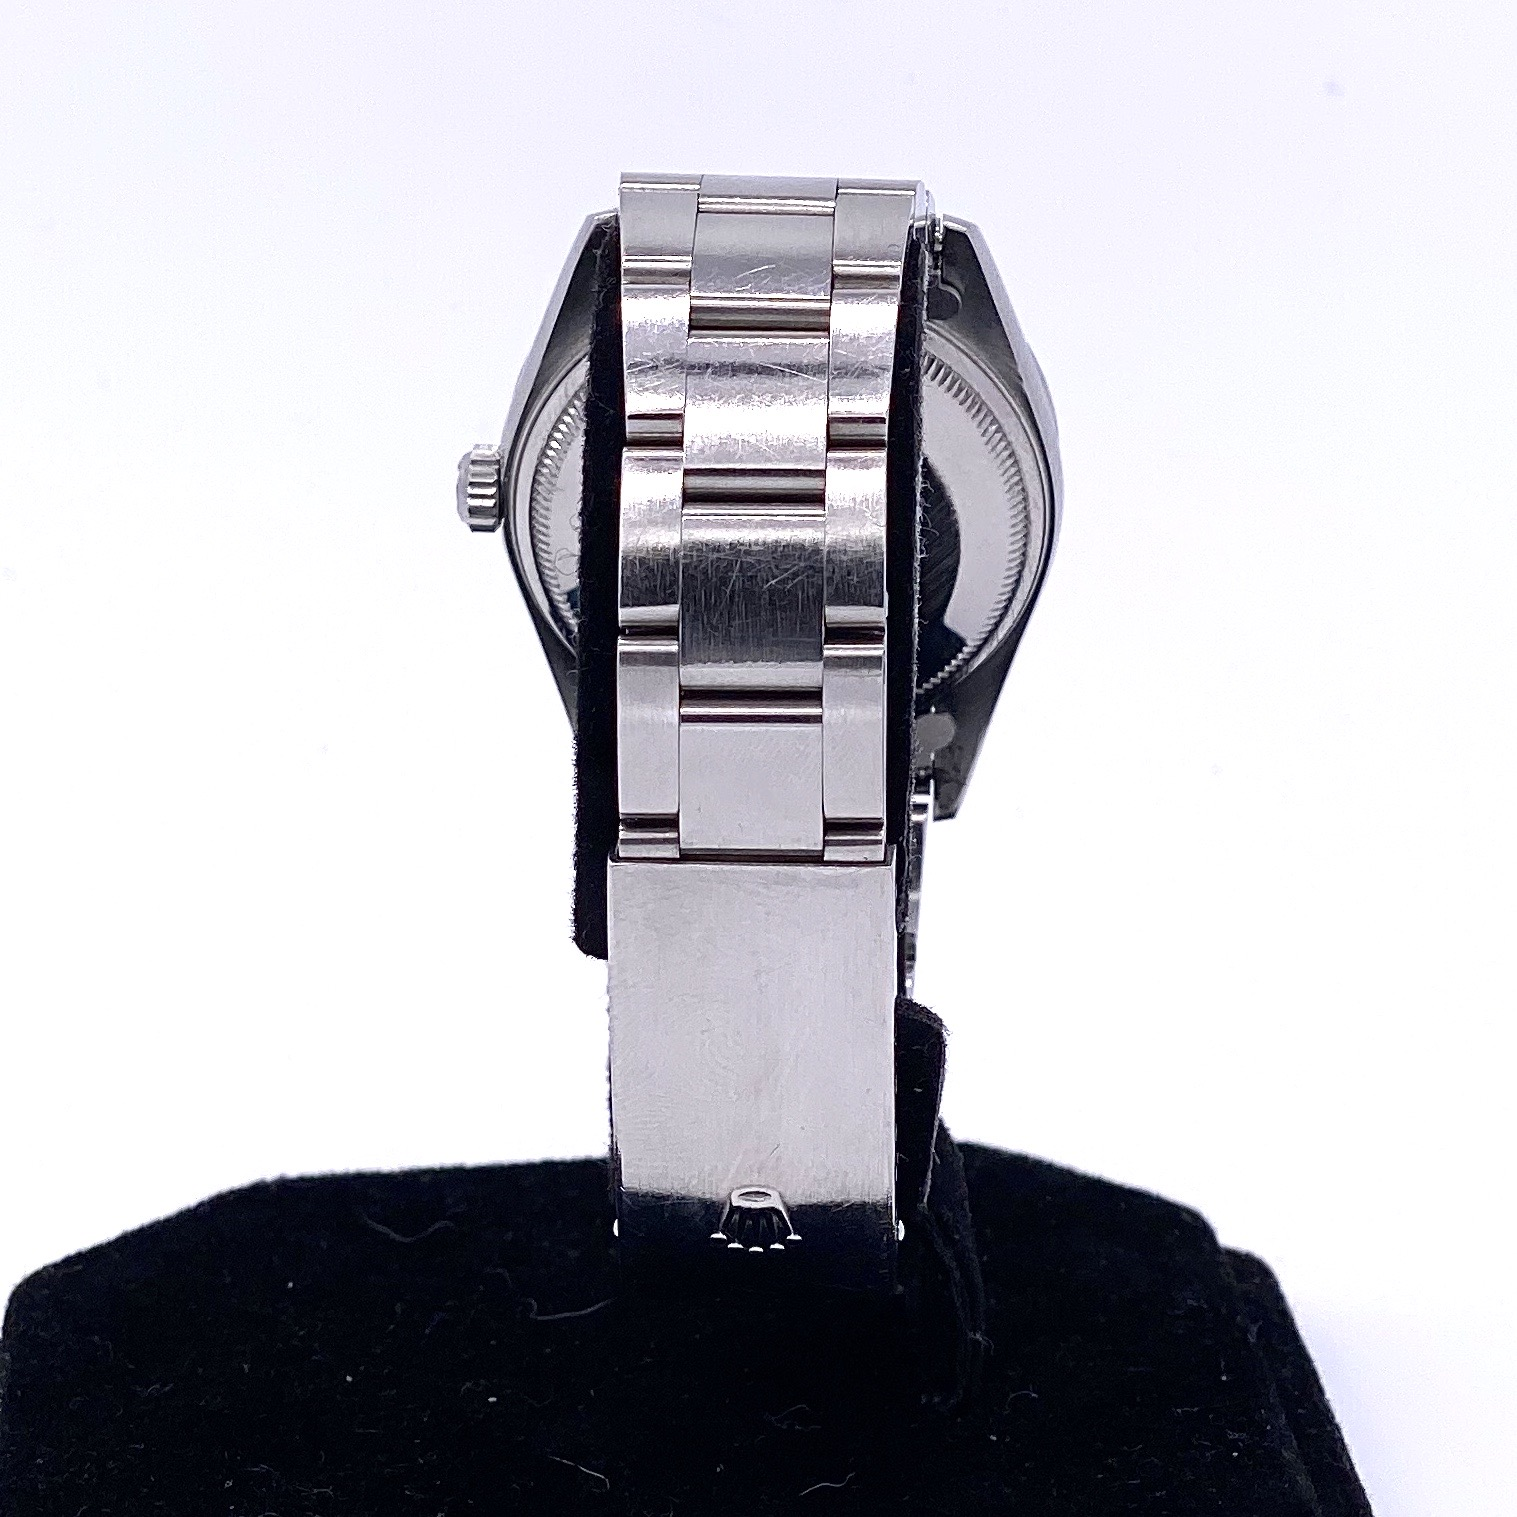 Lot 28 - Rolex Oyster Date ref 15210